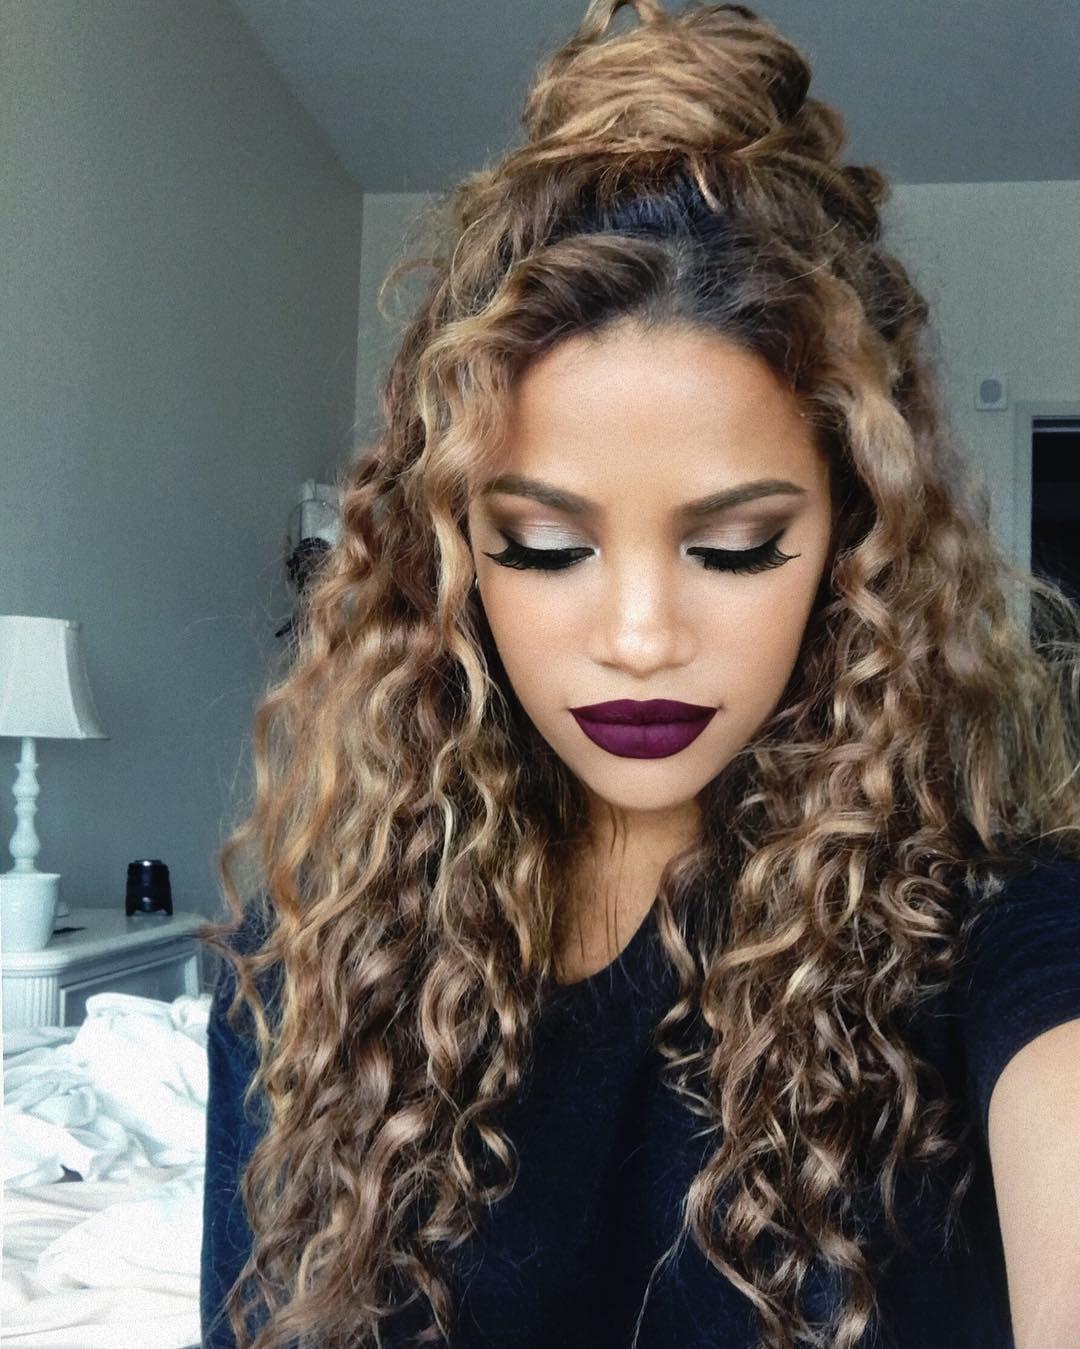 Como Ser Una Chica Tumblr Peinados Para Cabello Rizado Wattpad